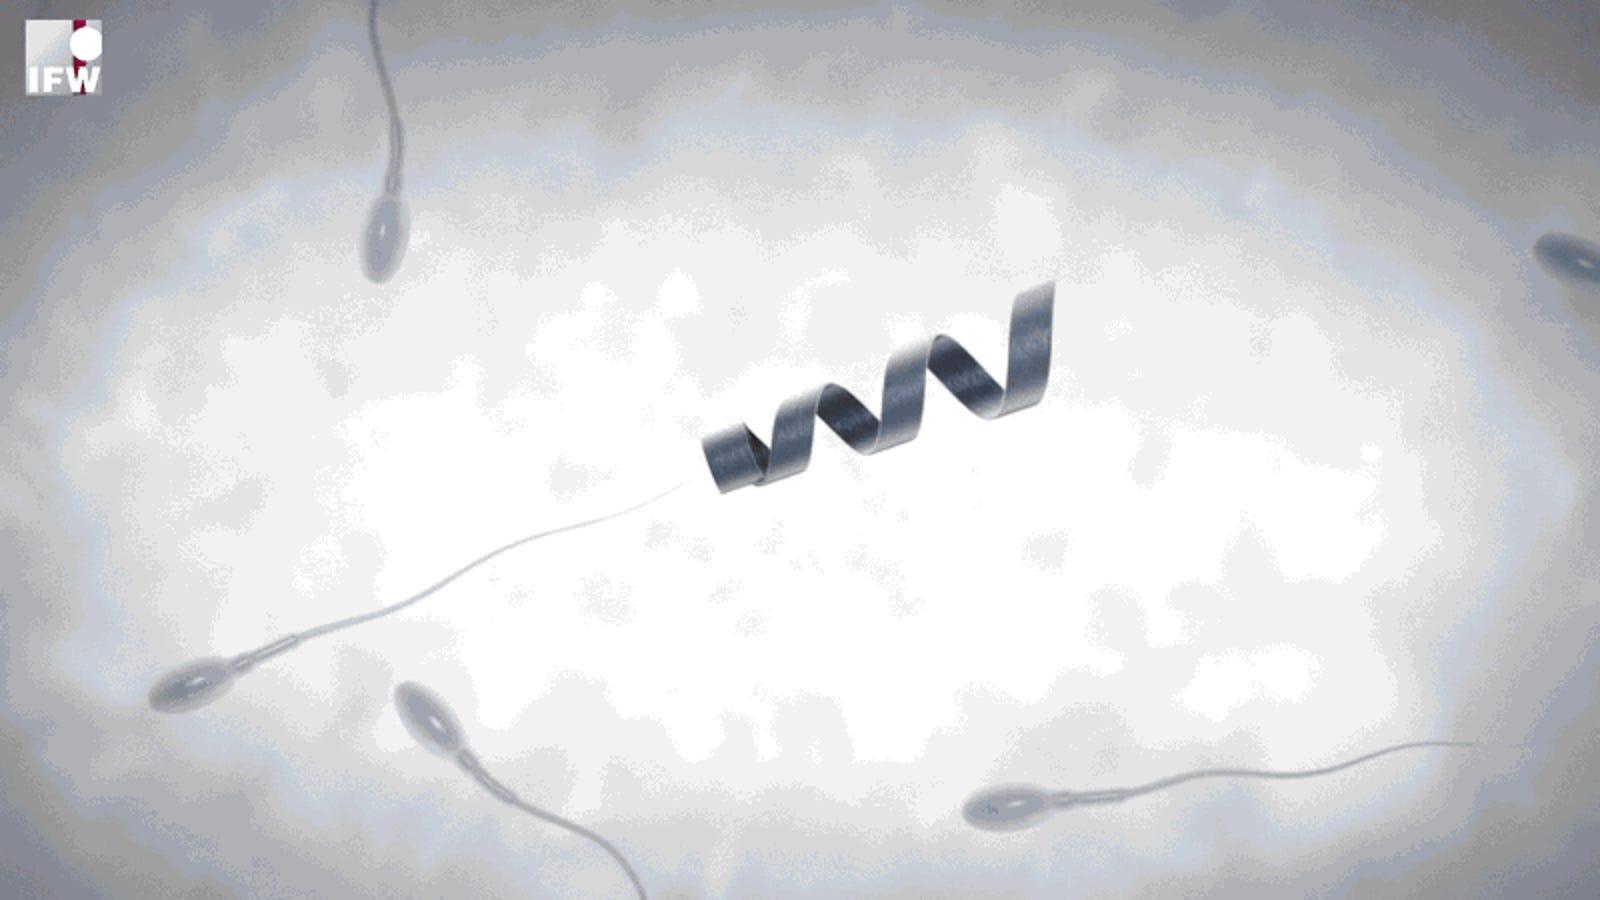 Spermbot, un nanorrobot que ayuda a los espermatozoides vagos a fecundar el óvulo